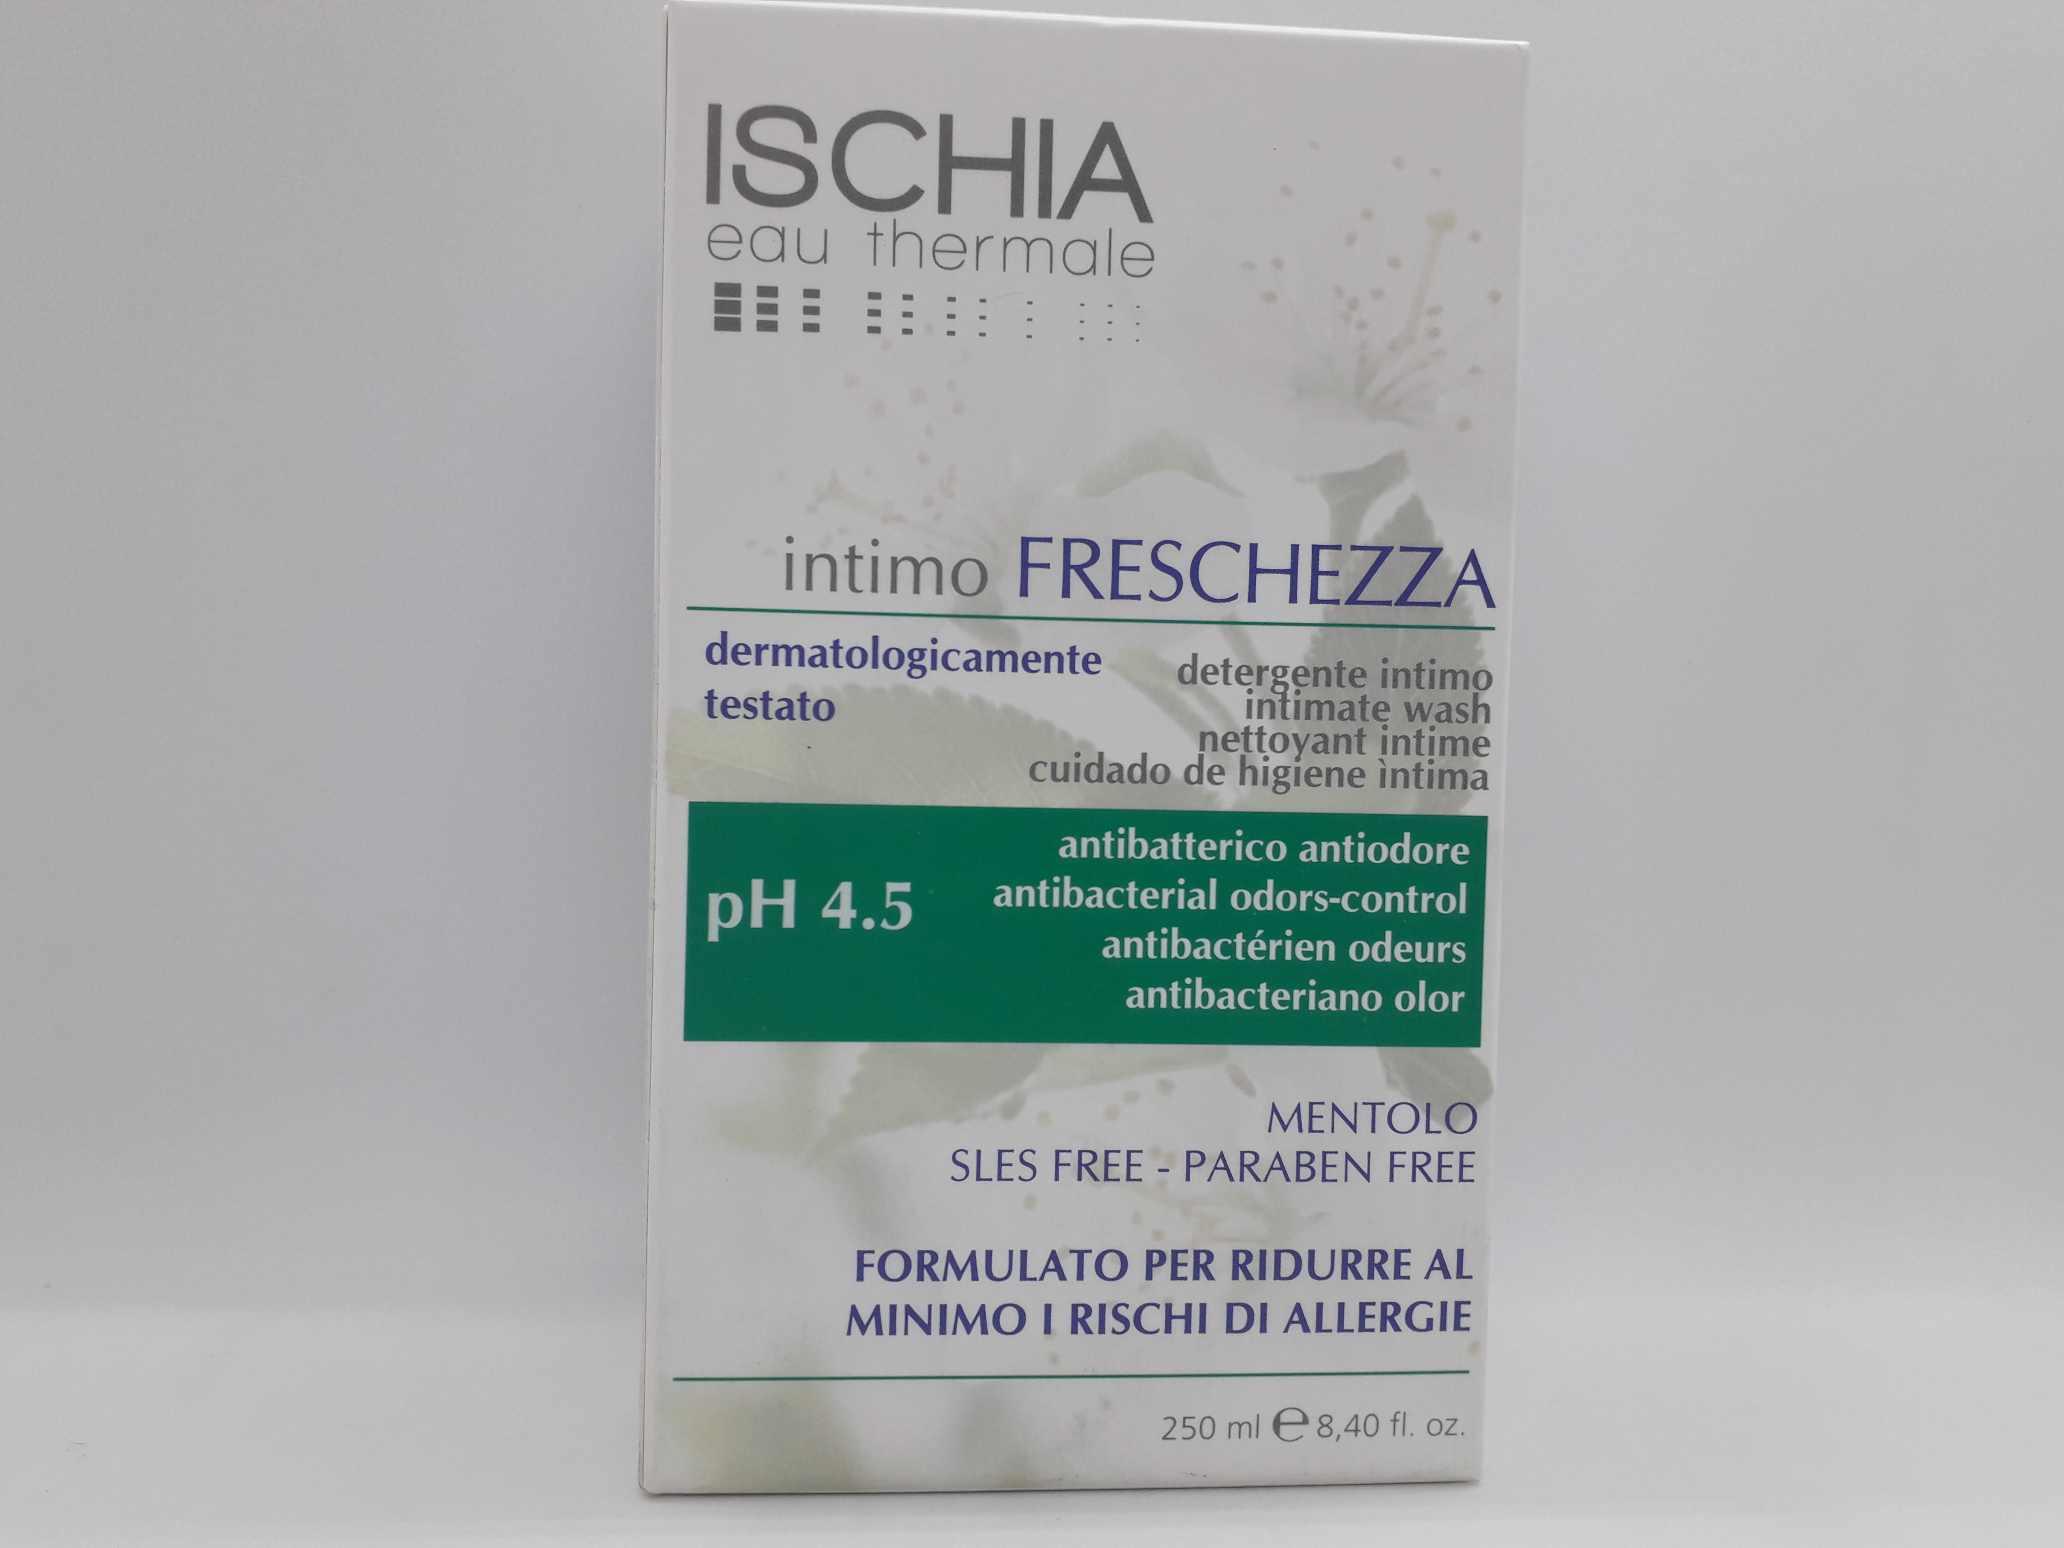 ISCHIA EAU THERMALE DETERGENTE INTIMO MENT PH 5 250 ML - Farmaciaempatica.it